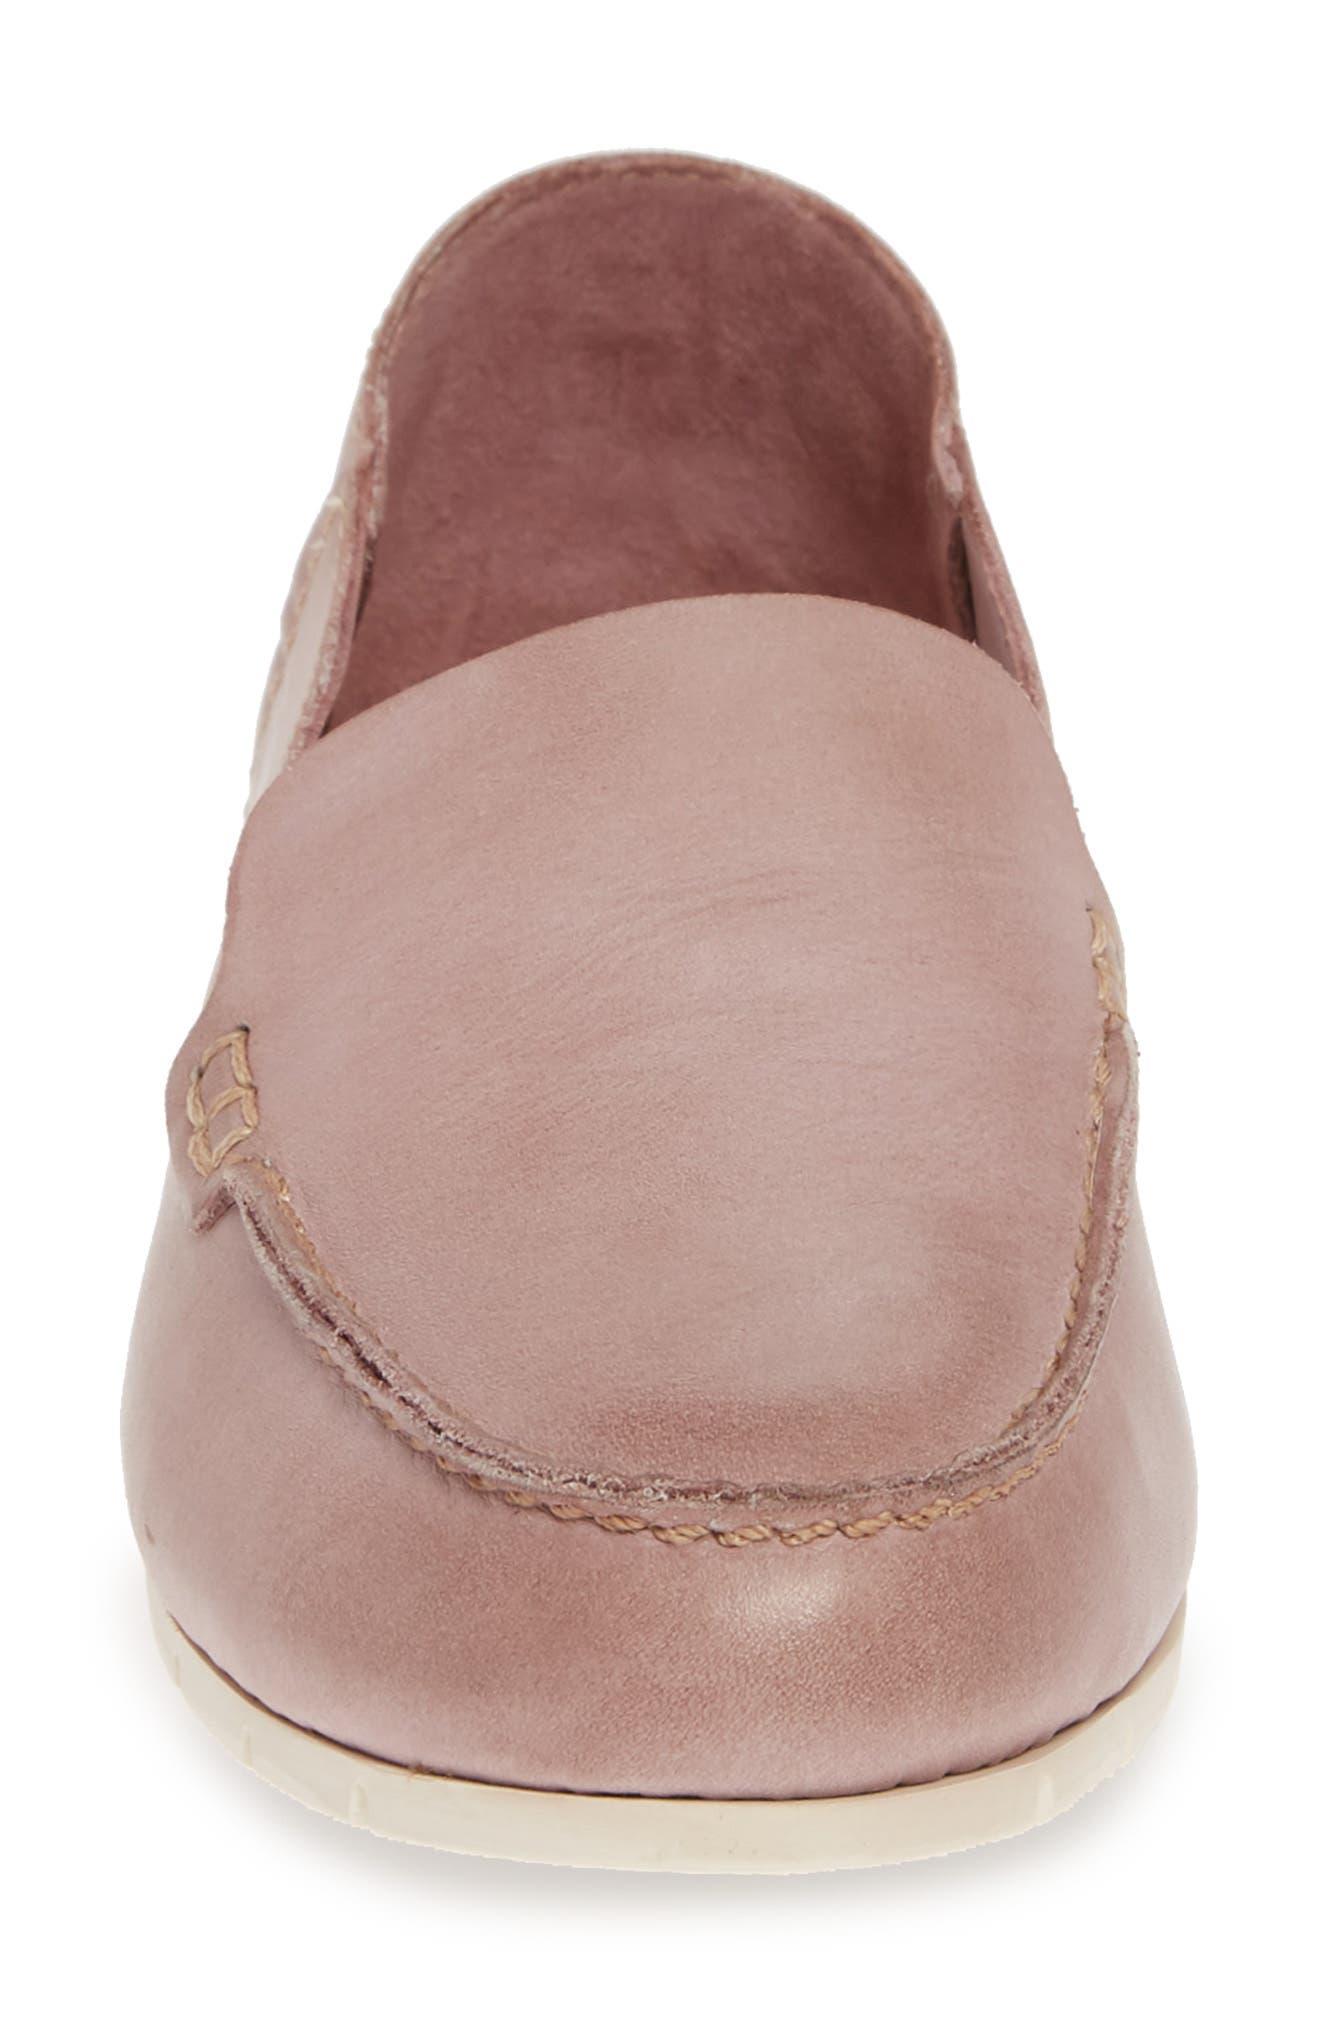 Sedona Venetian Loafer,                             Alternate thumbnail 4, color,                             LILAC